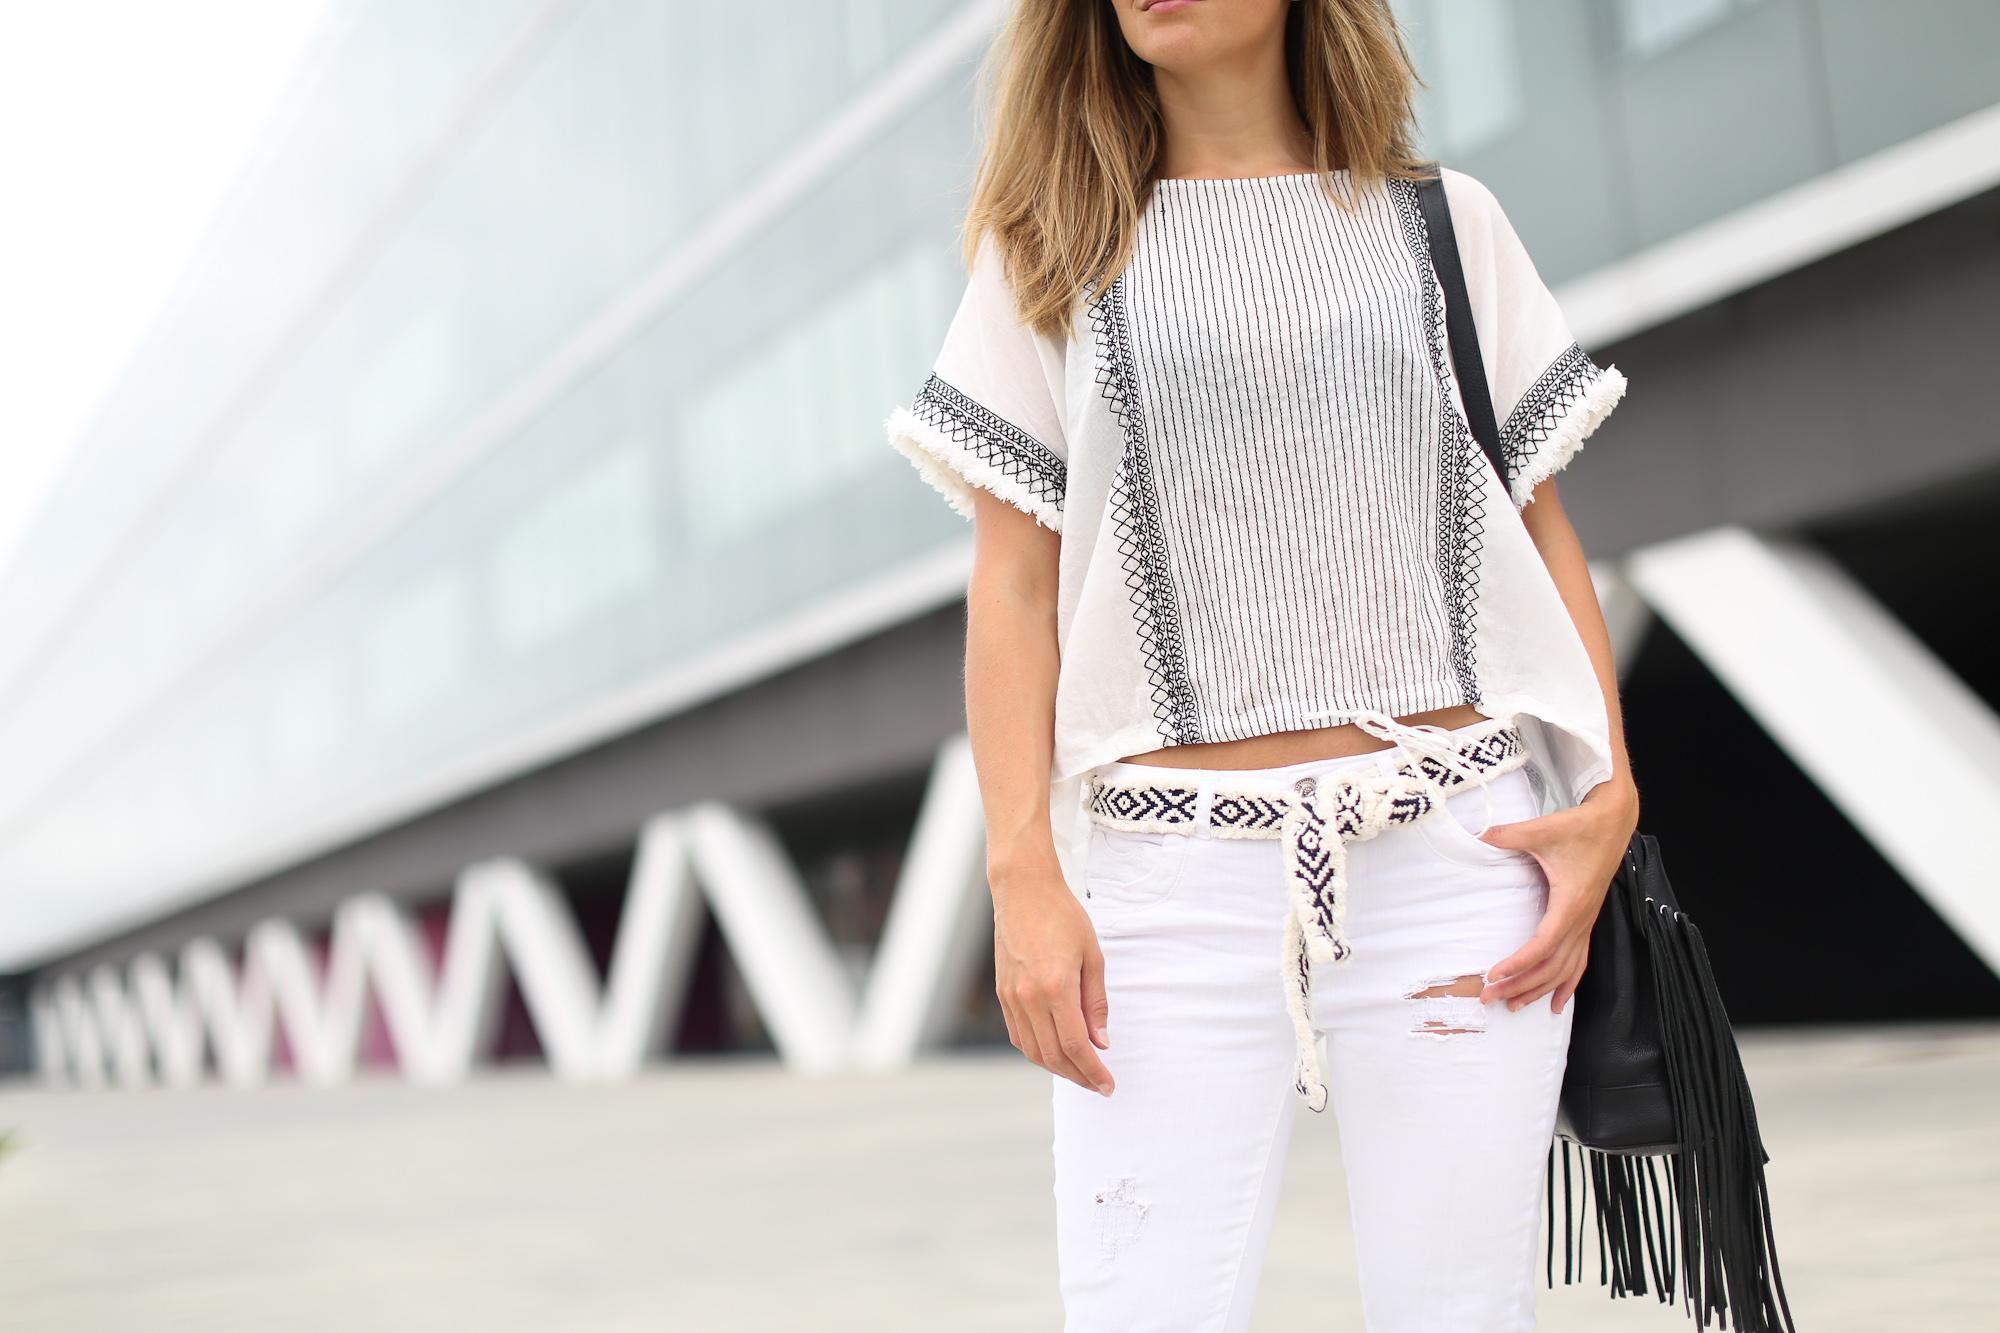 Clochet_streetstyle_zara_boho_top_vintage_grey_adidas_gazelle_leztinstreet_sandro_fringed_anik_bag-5